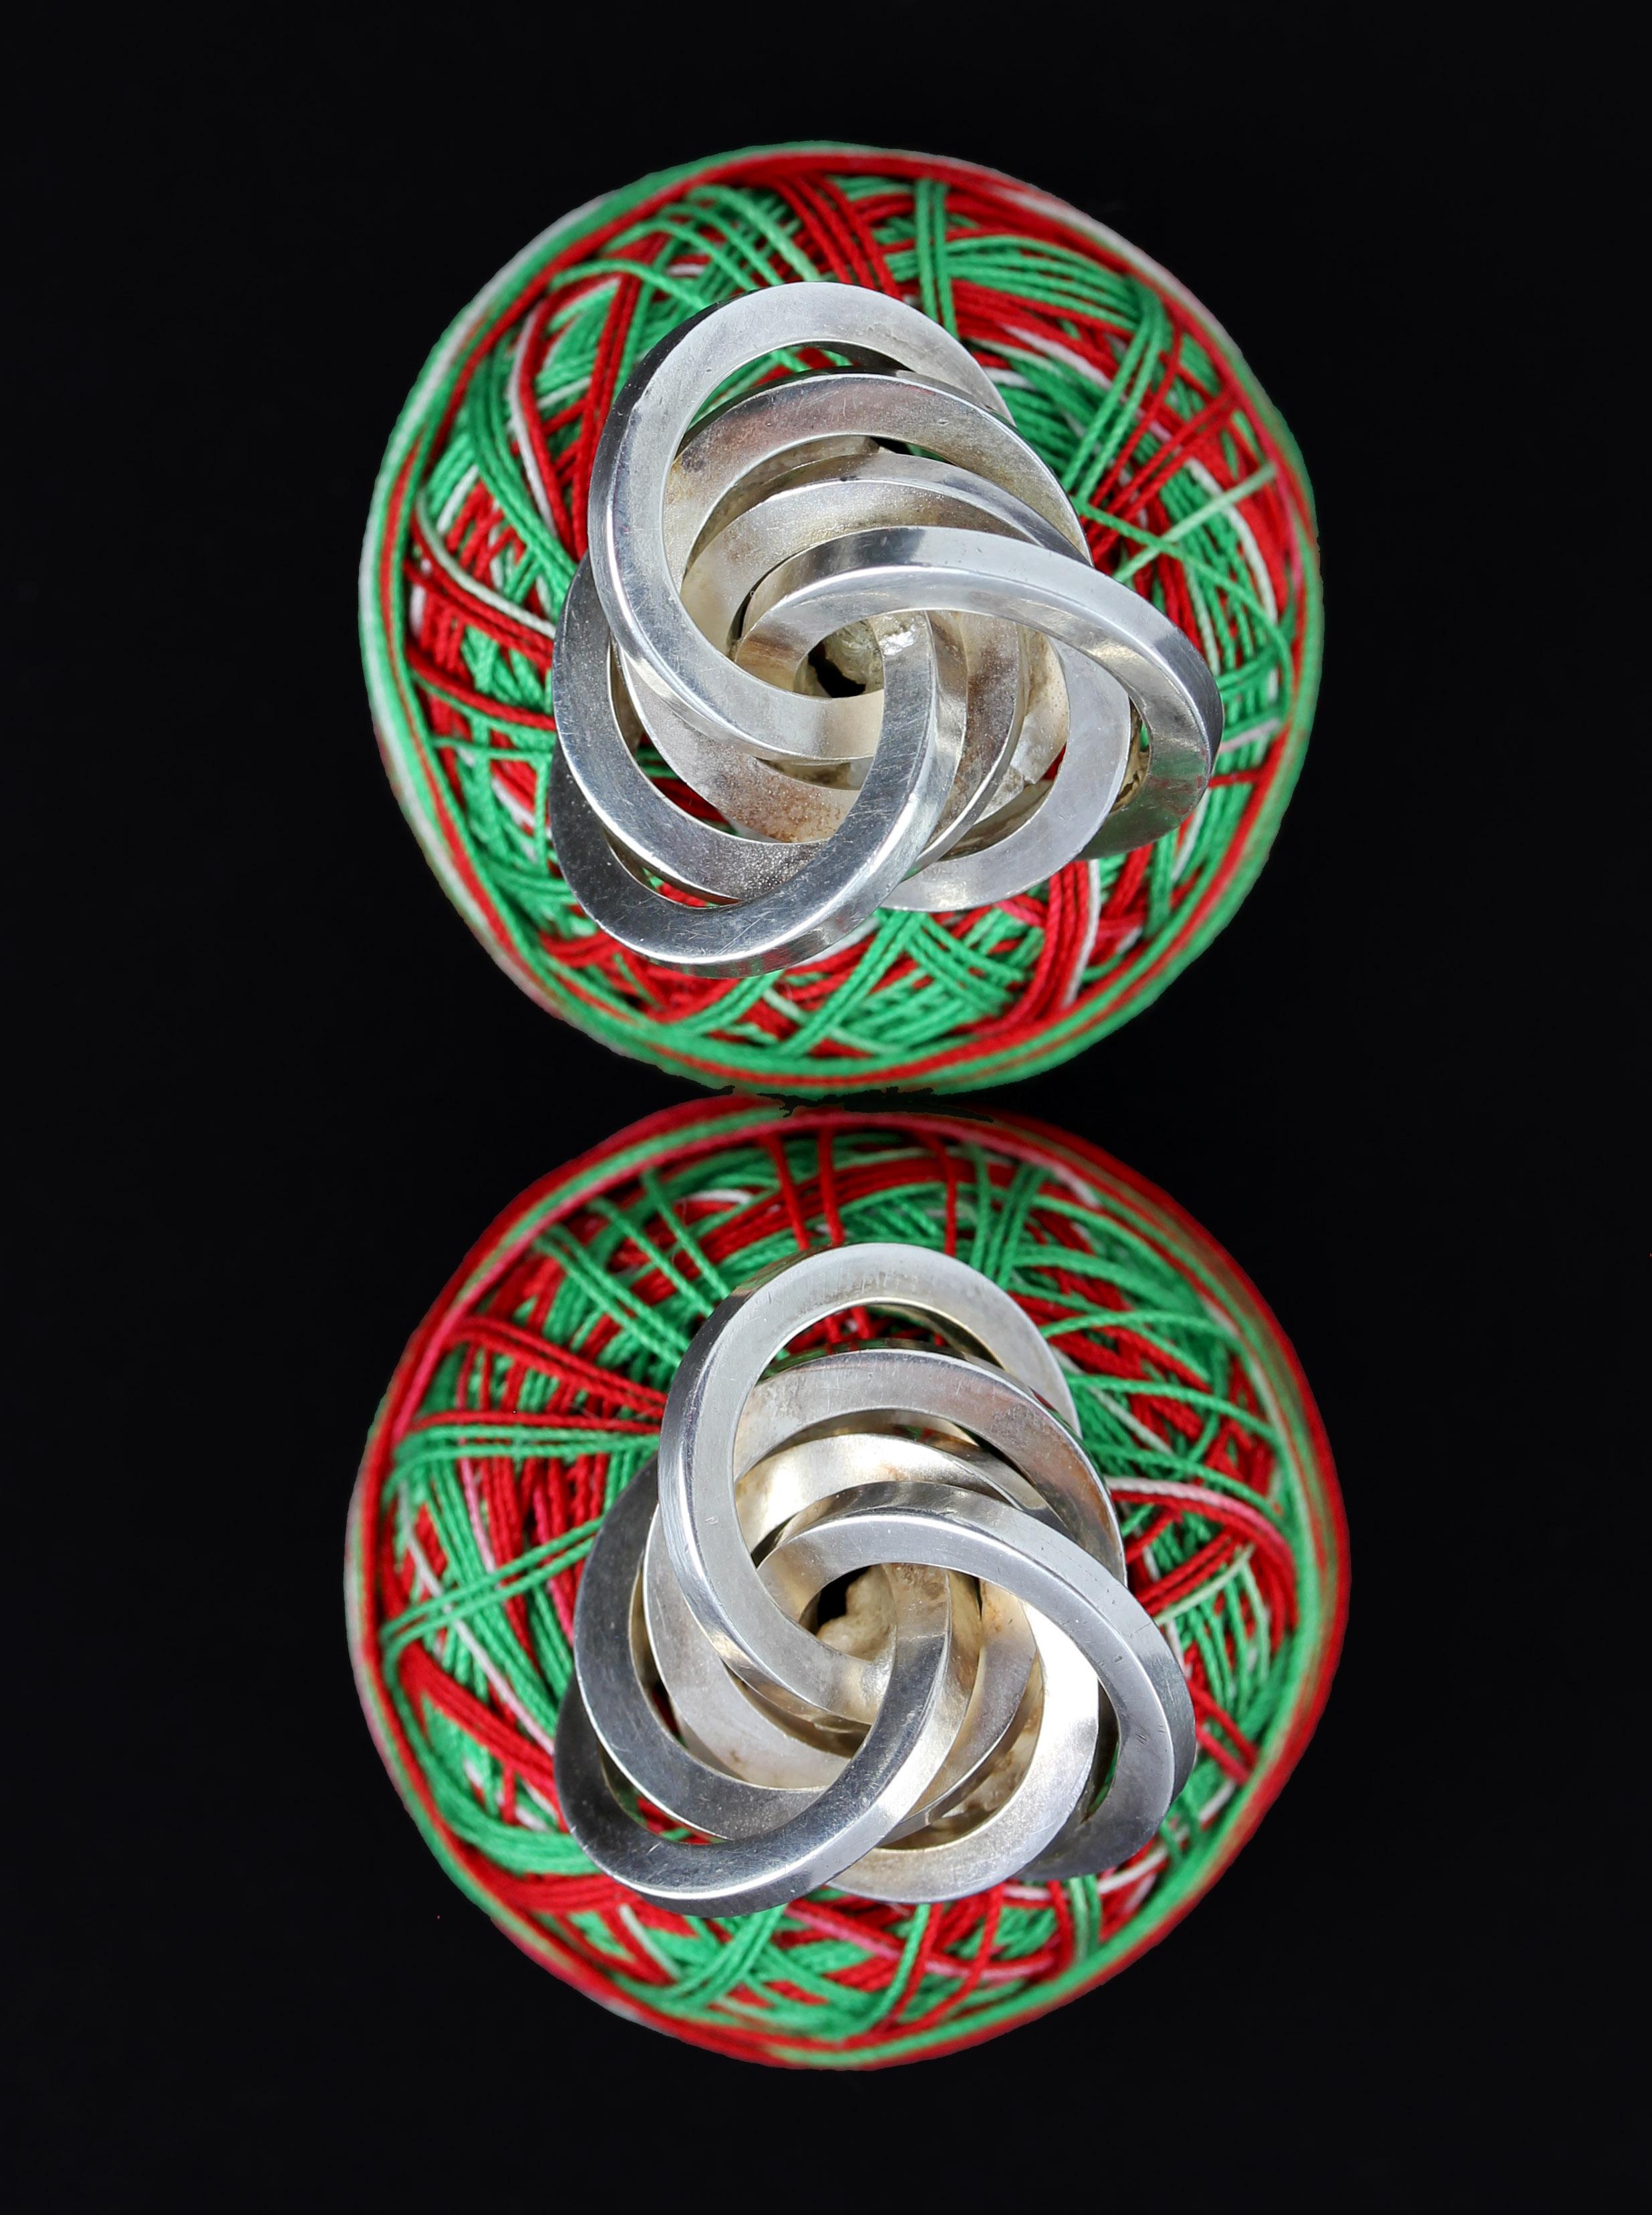 Big knot cufflinks